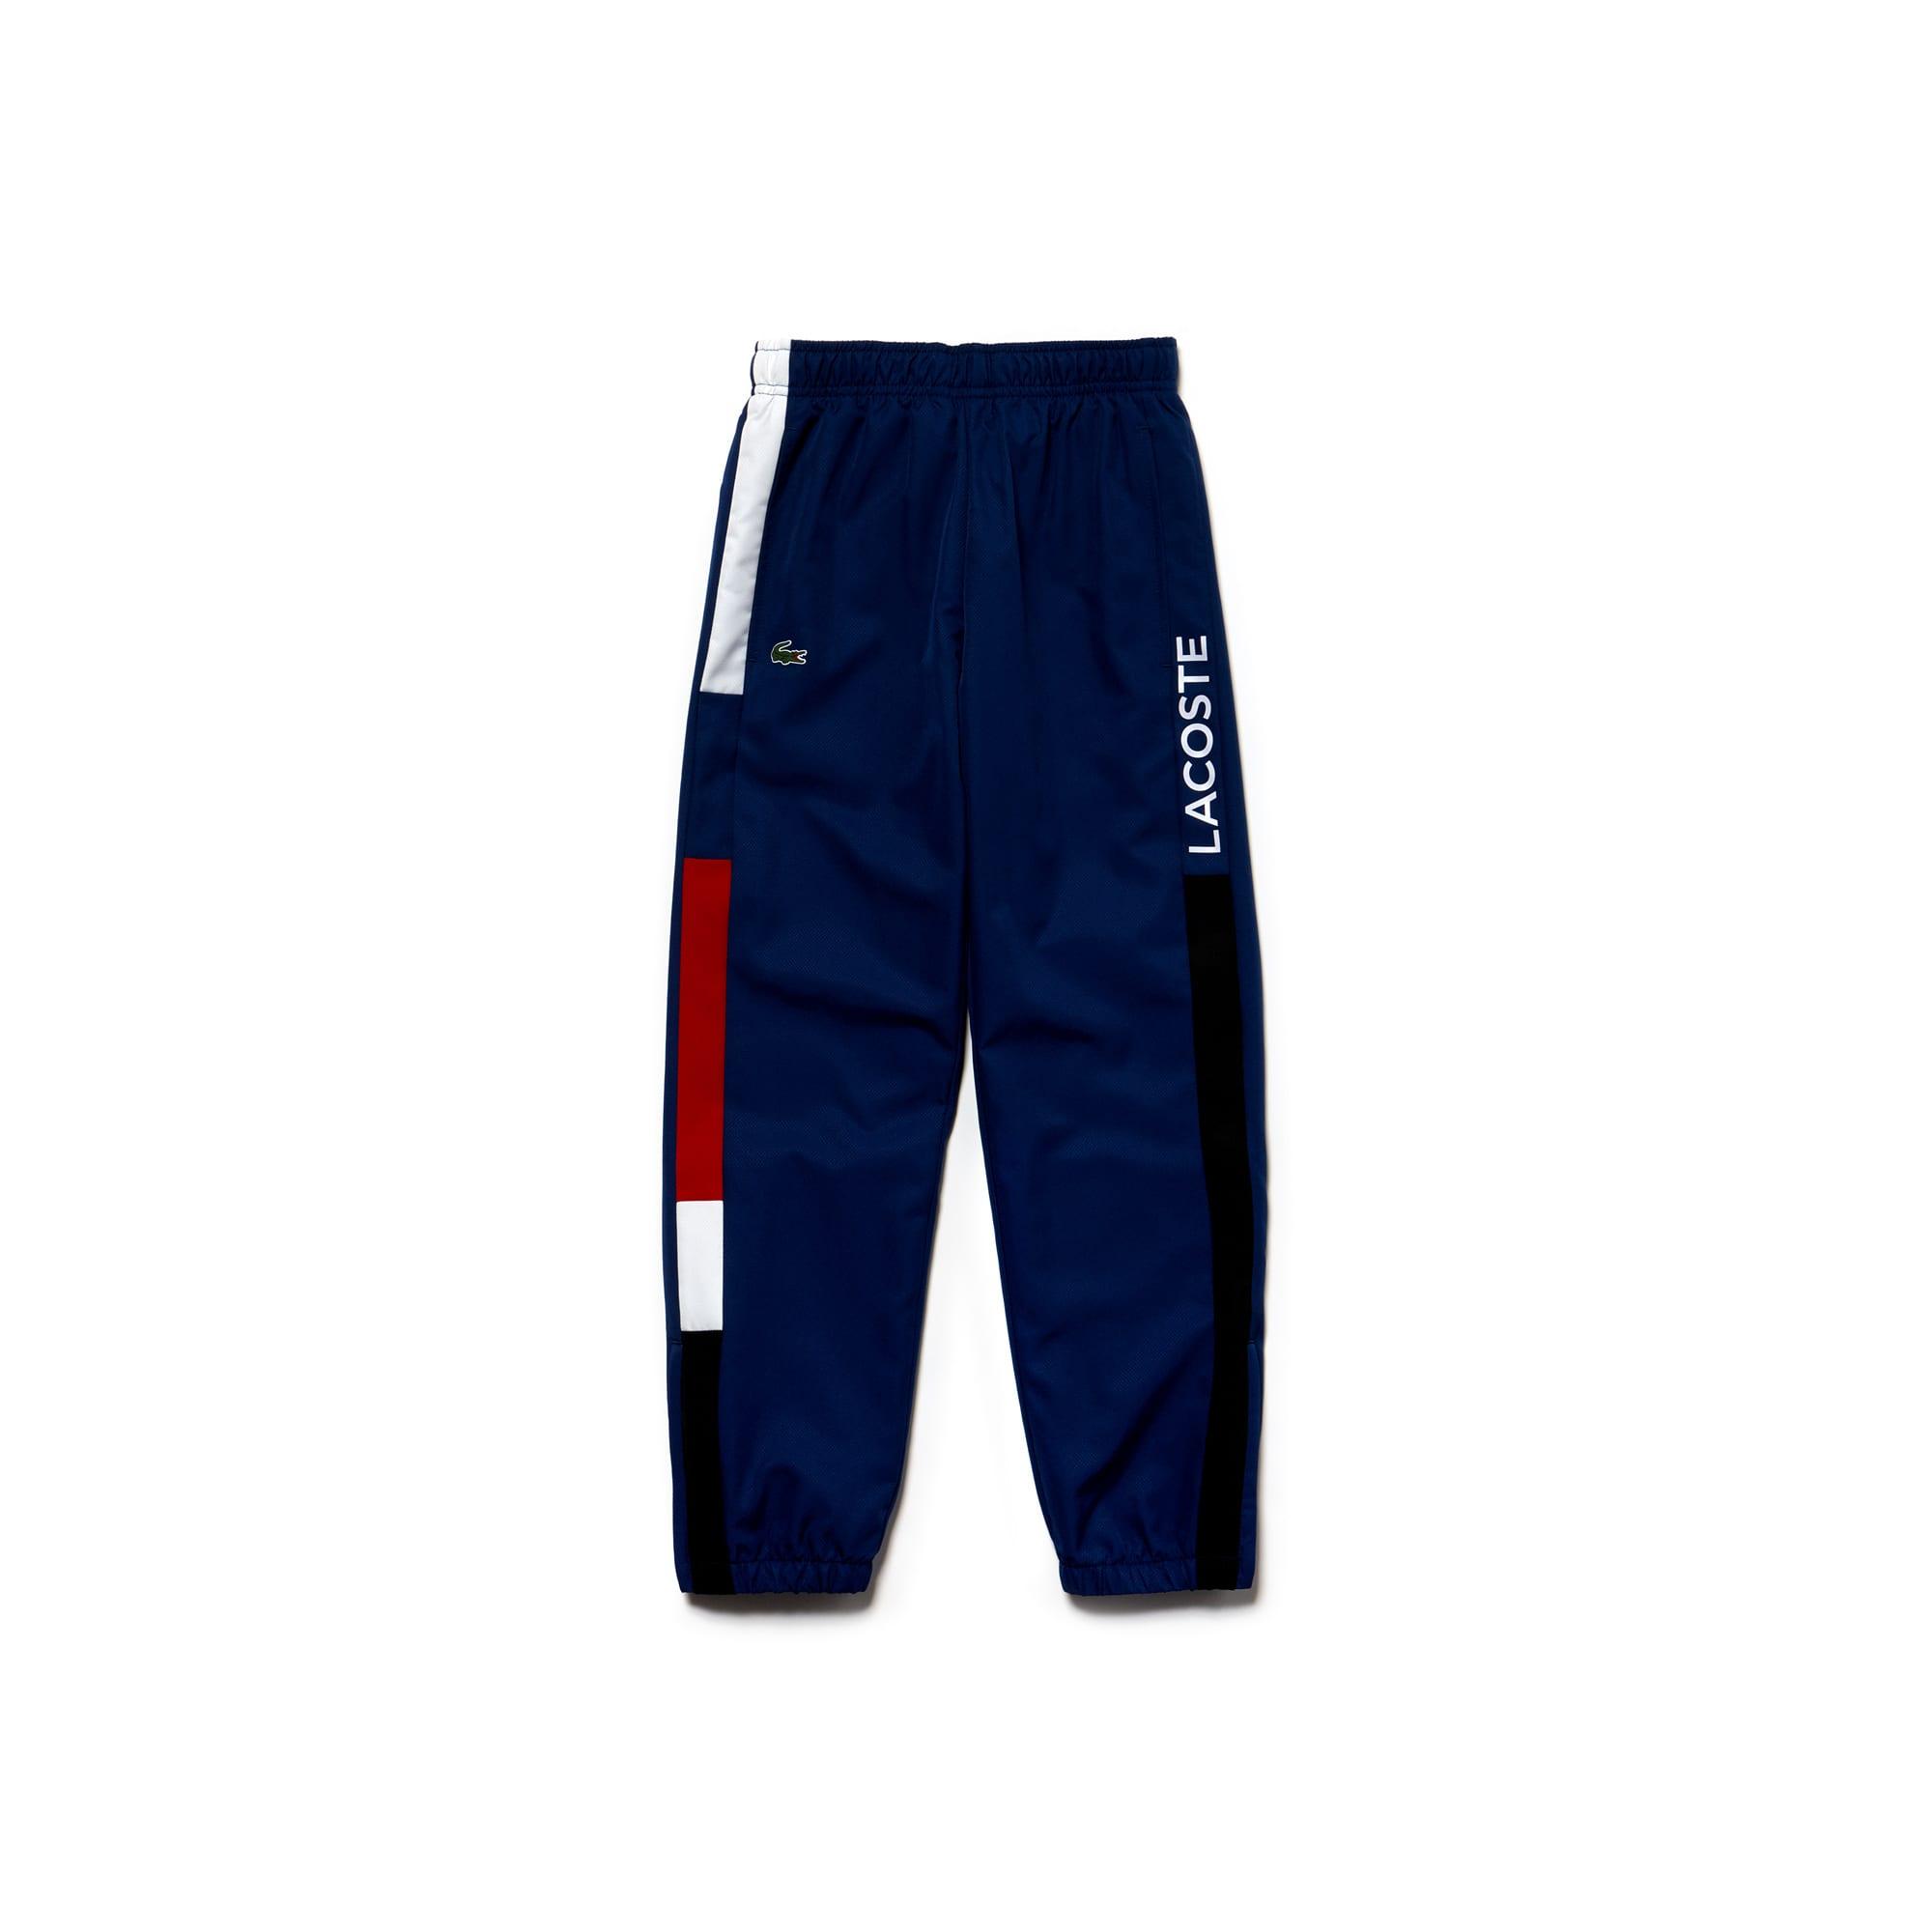 Pantalon de survêtement Garçon Tennis Lacoste SPORT en taffetas